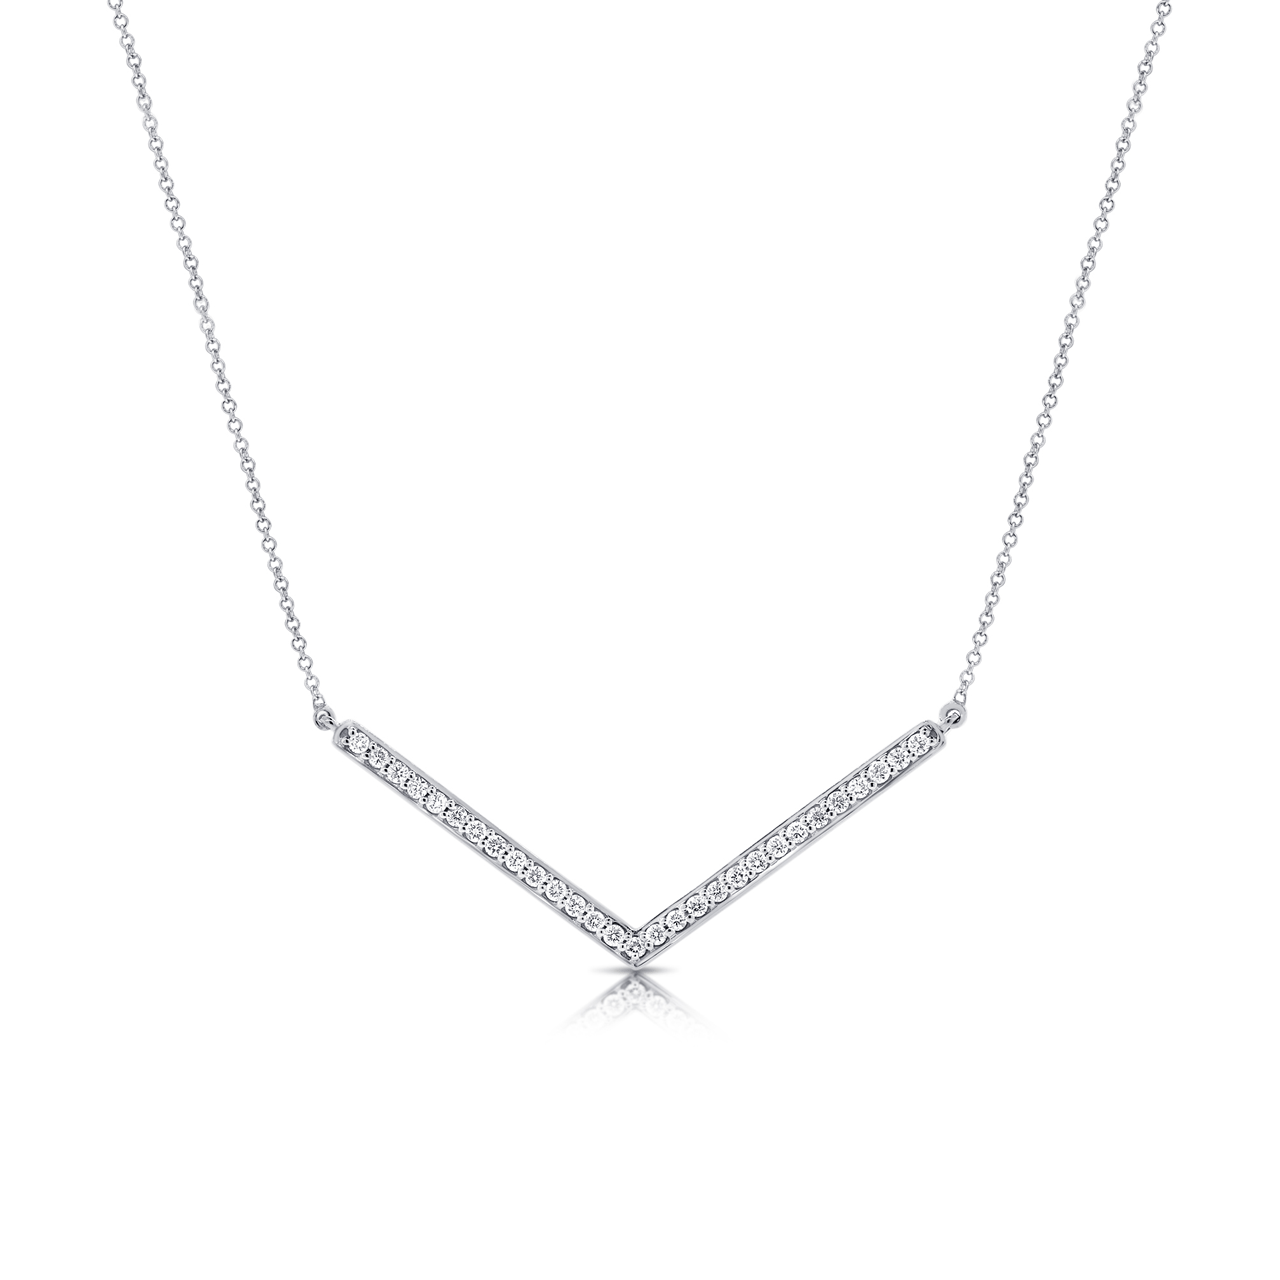 Minimalist v-shaped diamond and white gold necklace.